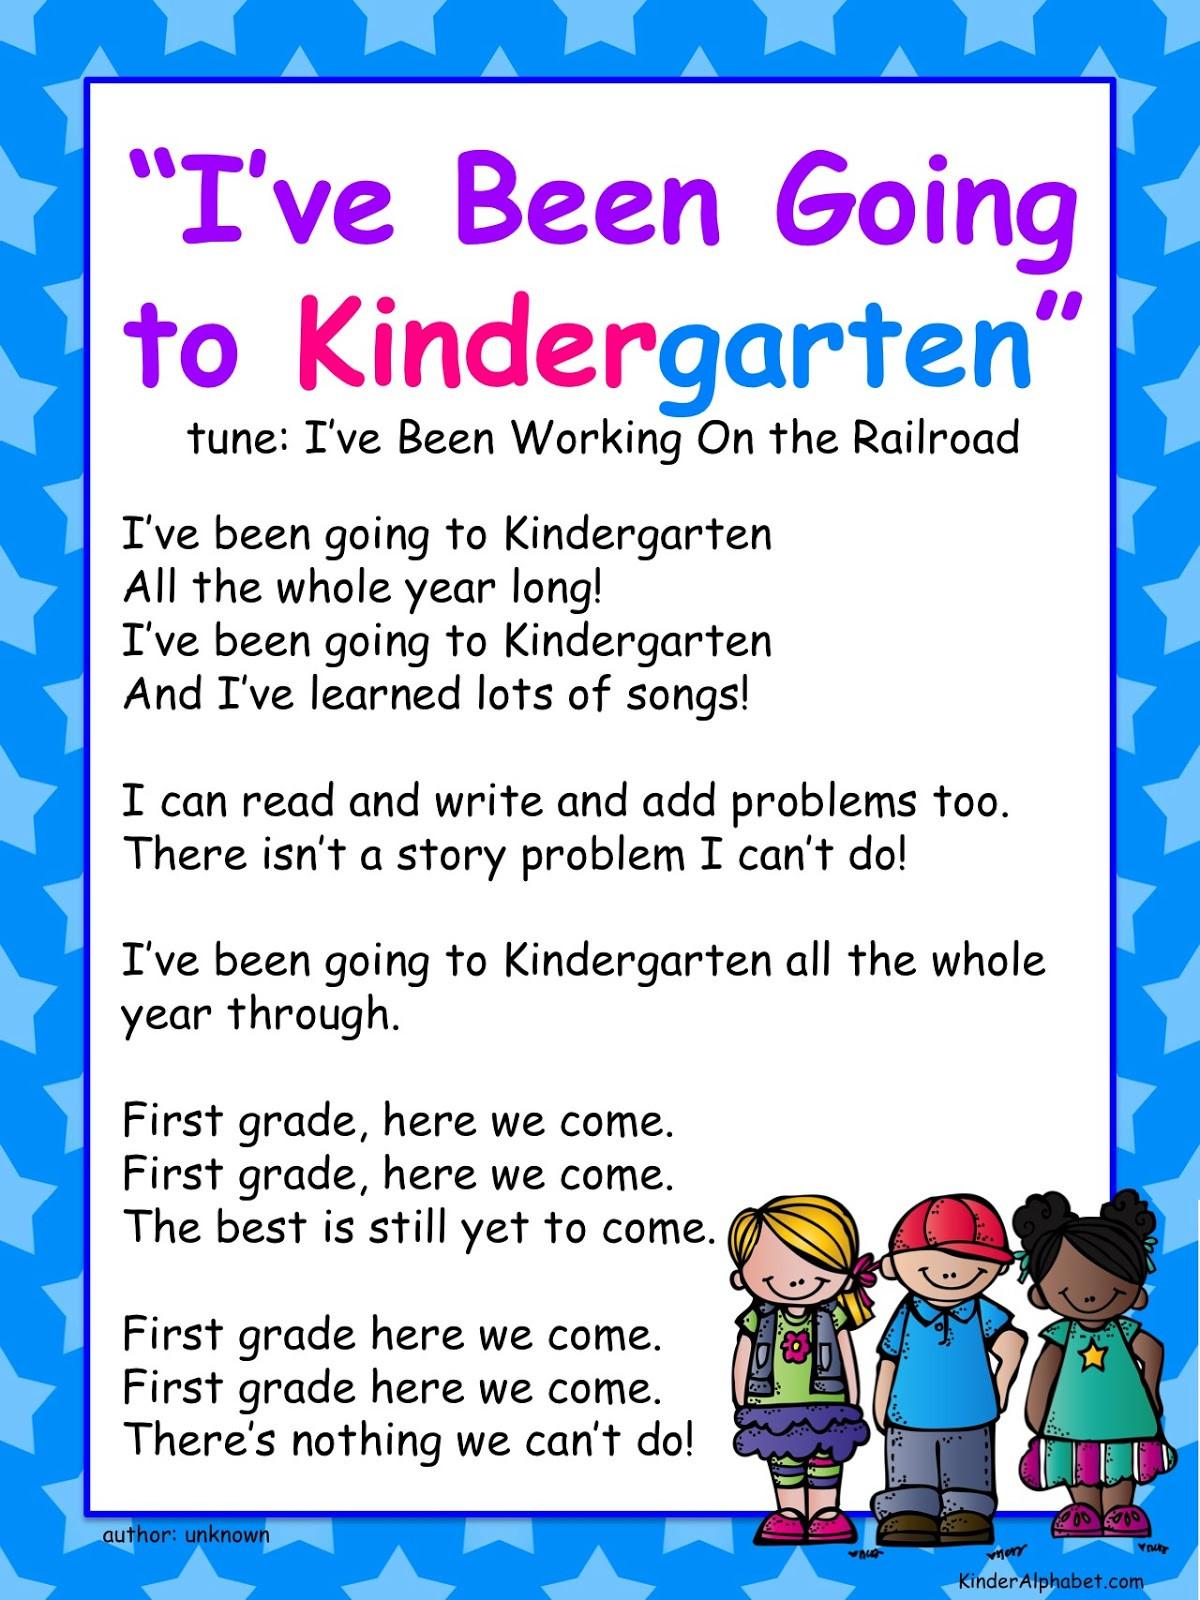 Kindergarten Graduation Quotes  Quotes About Preschool Graduation QuotesGram